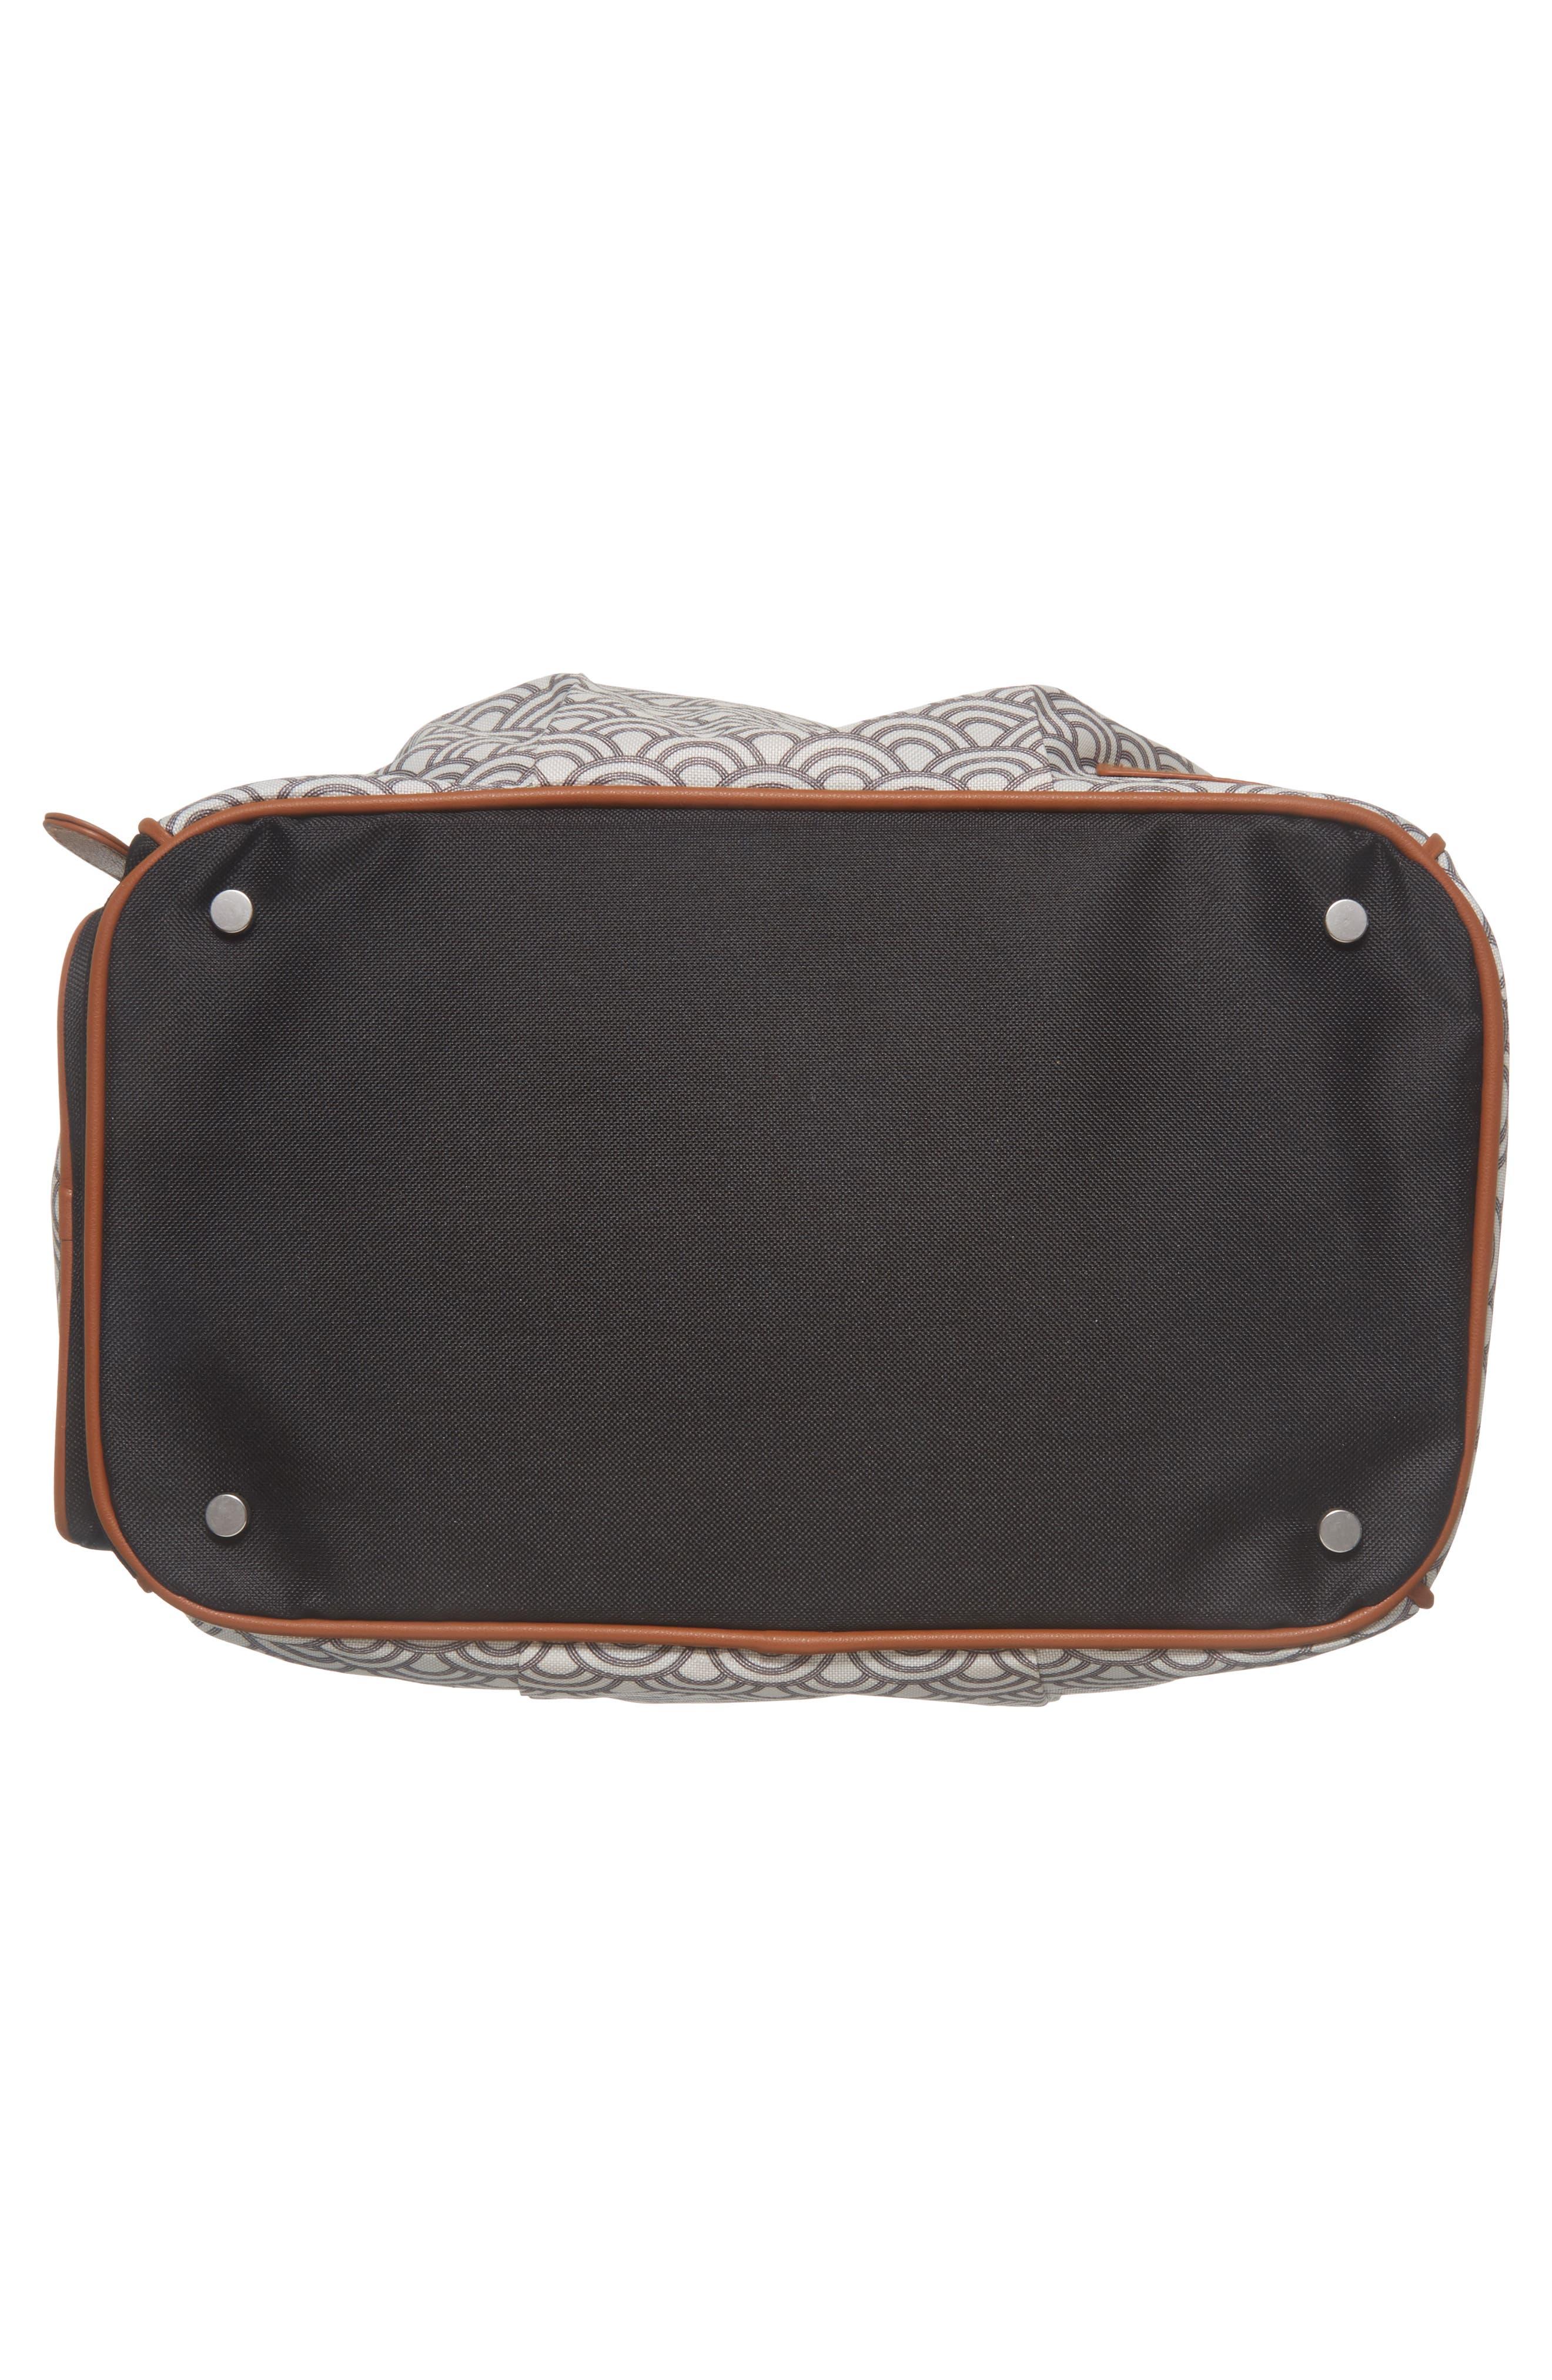 Style Diaper Bag,                             Alternate thumbnail 7, color,                             BLACK